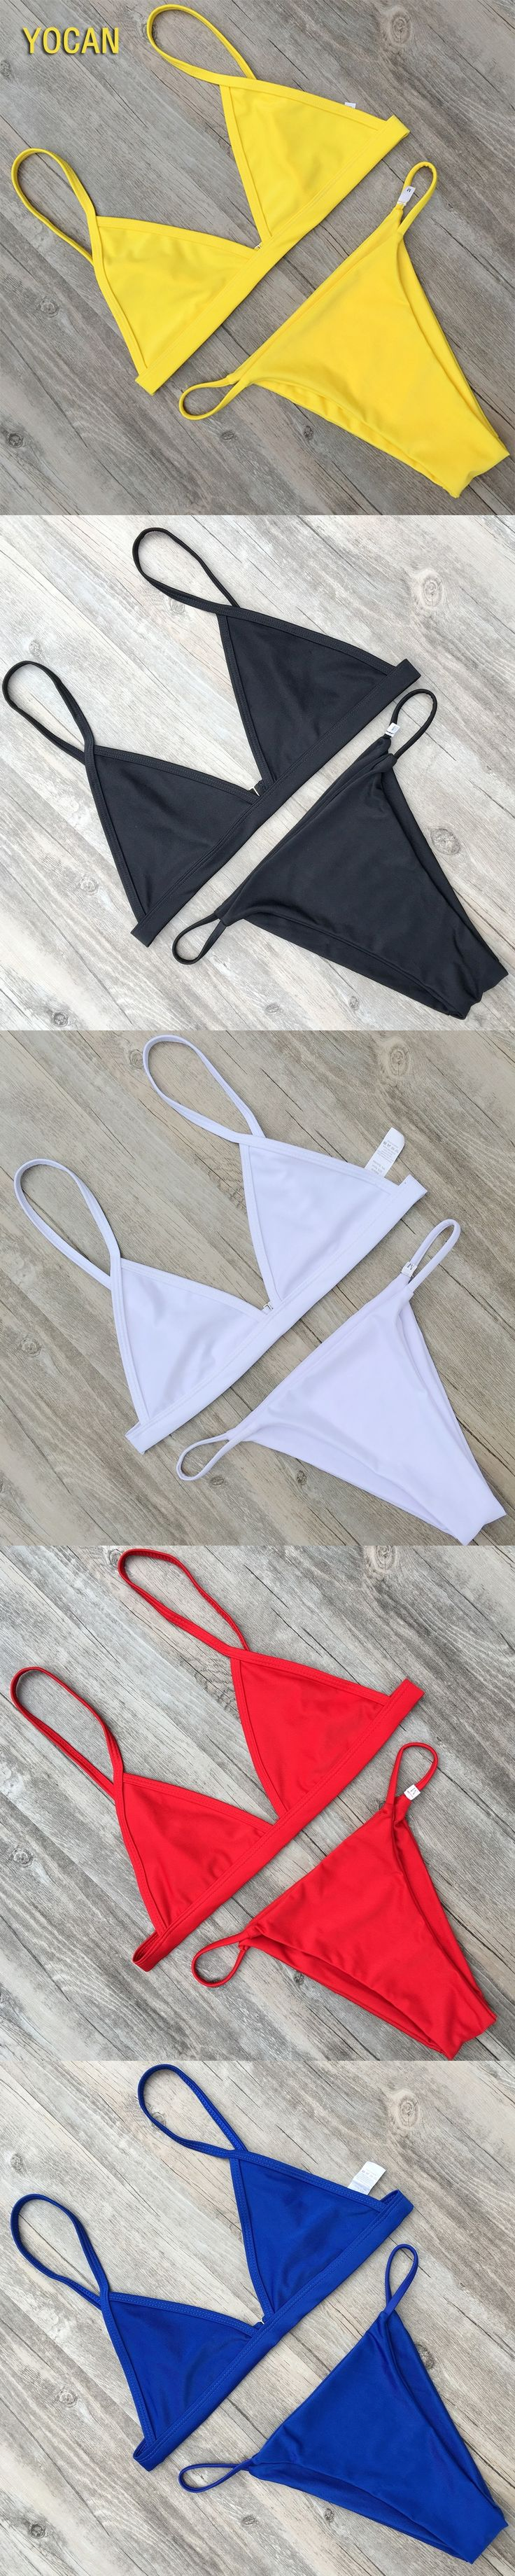 Thong Bikini Set Sexy Micro Bikini 2017 Brazilian Bikini Black Swimwear Women Bathing Suit Swimsuit Bikini Tanga Maillot De Bain